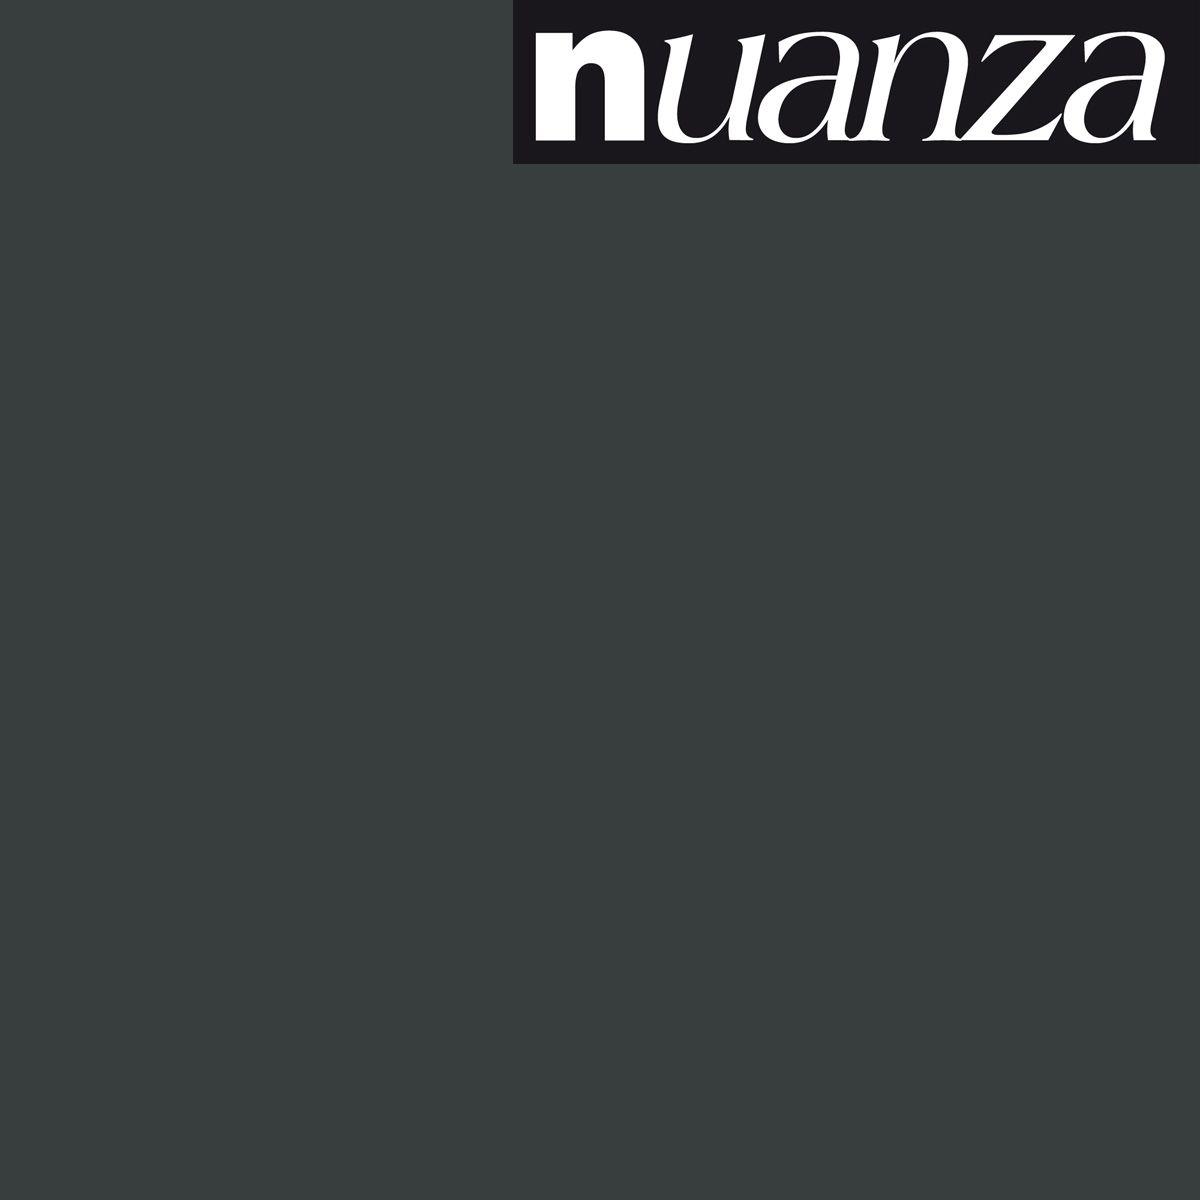 Peinture noir satin multisupports Nuanza 2.5l